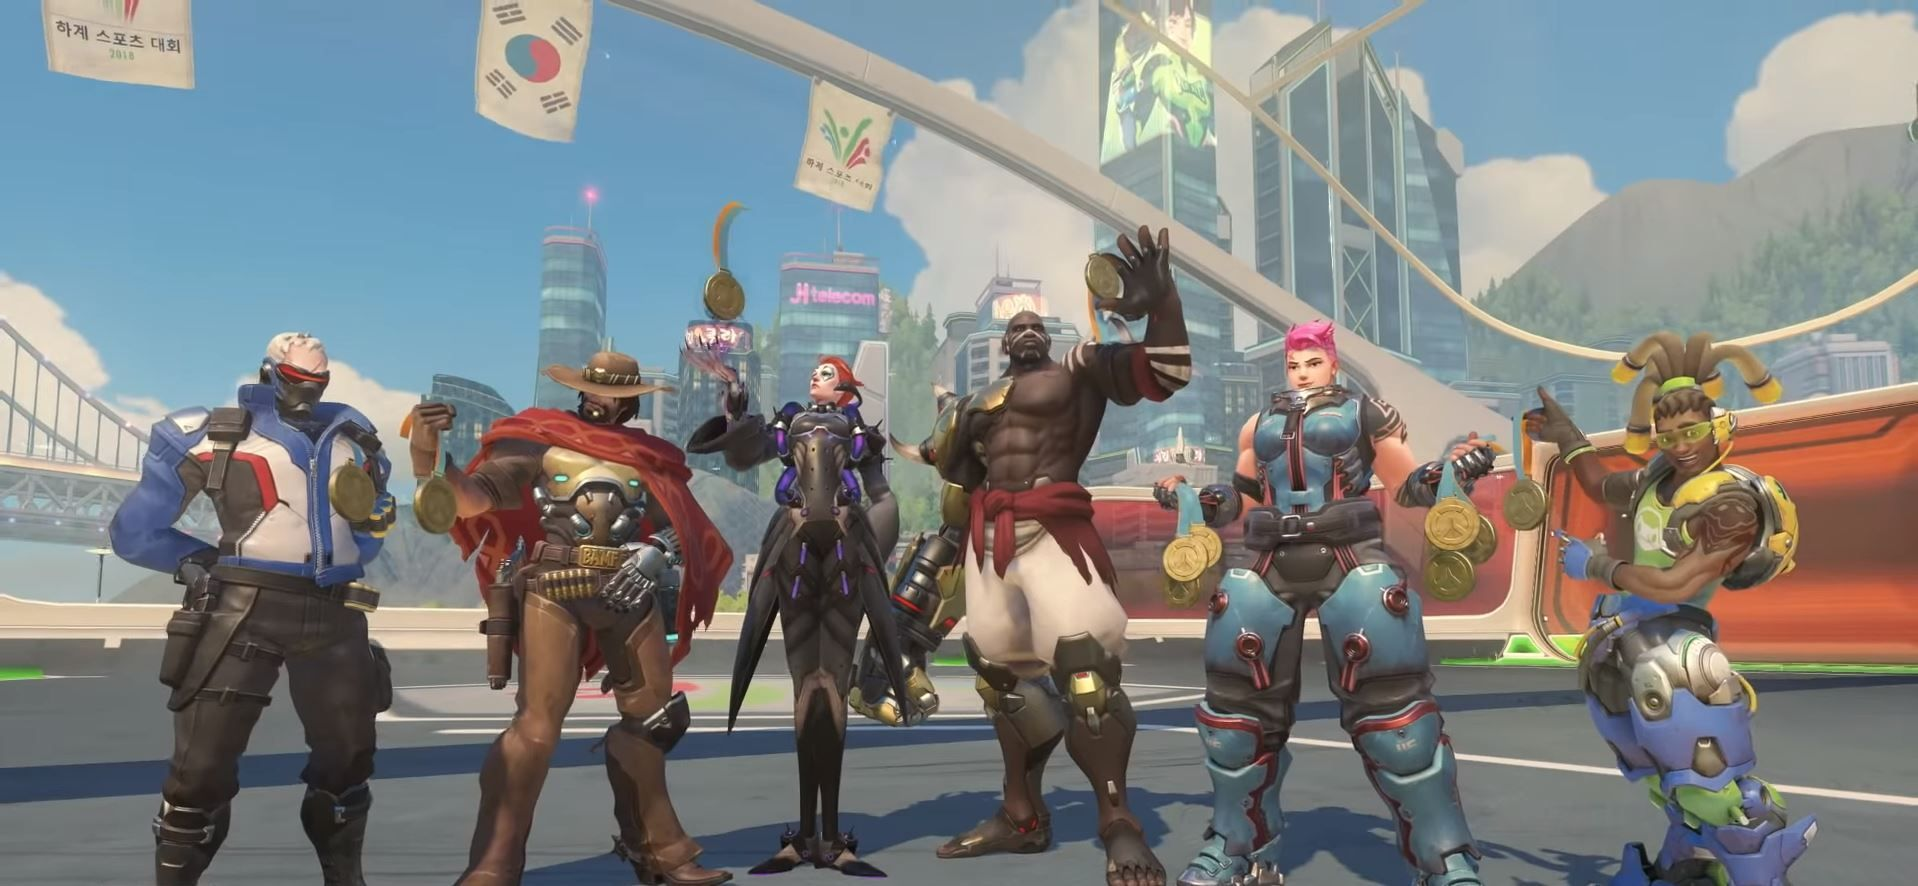 Overwatch juegos de verano 2018 imagen 2